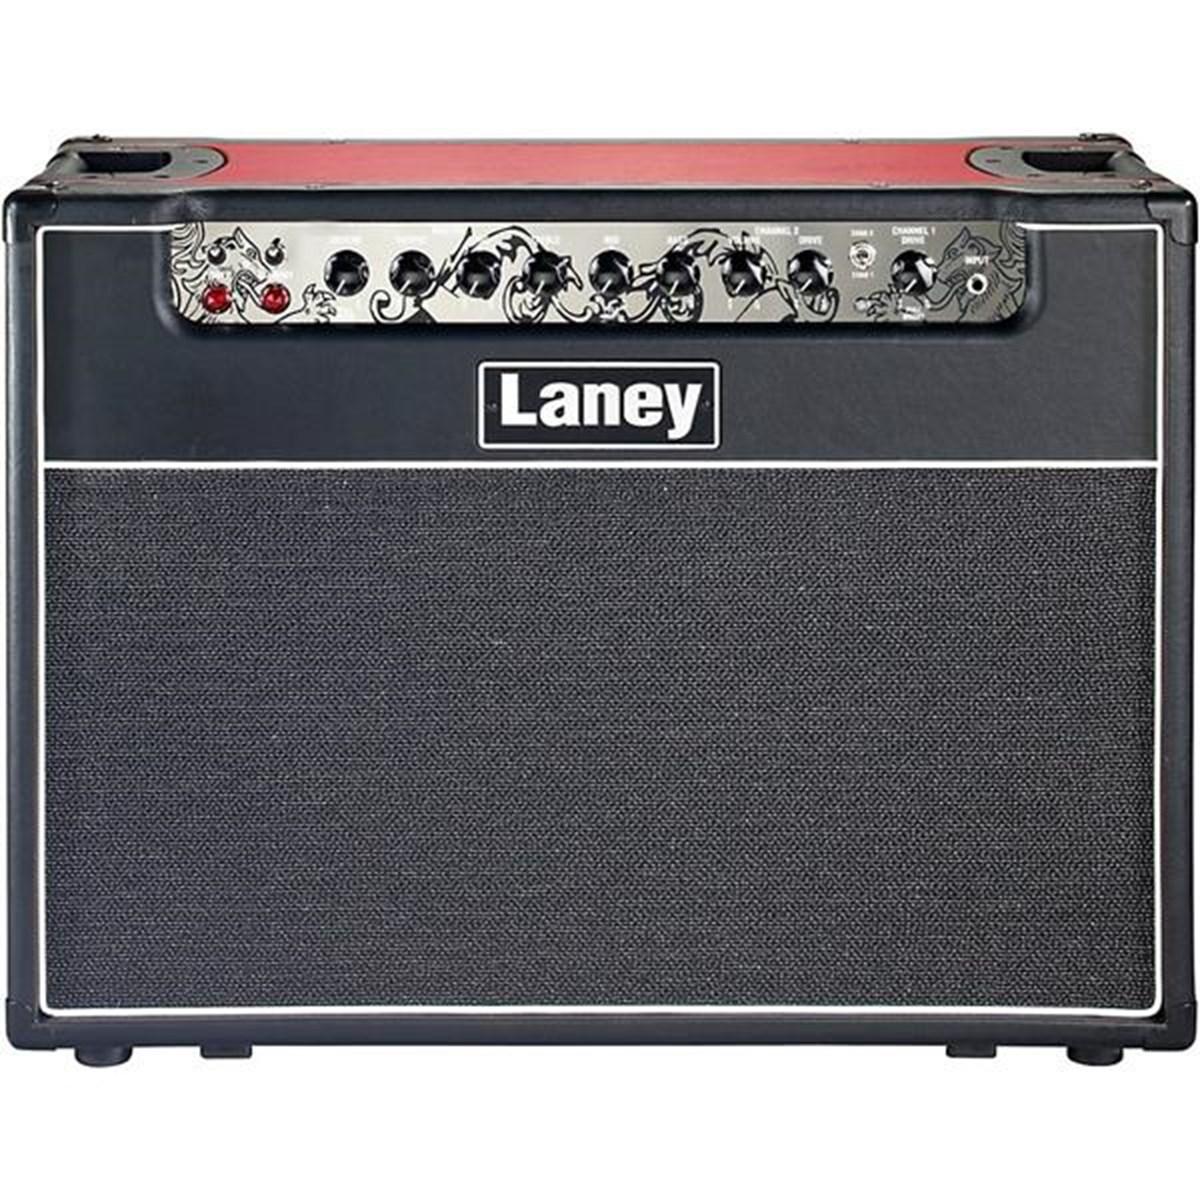 LANEY-GH30R-112-COMBO-1x12-30-sku-24180